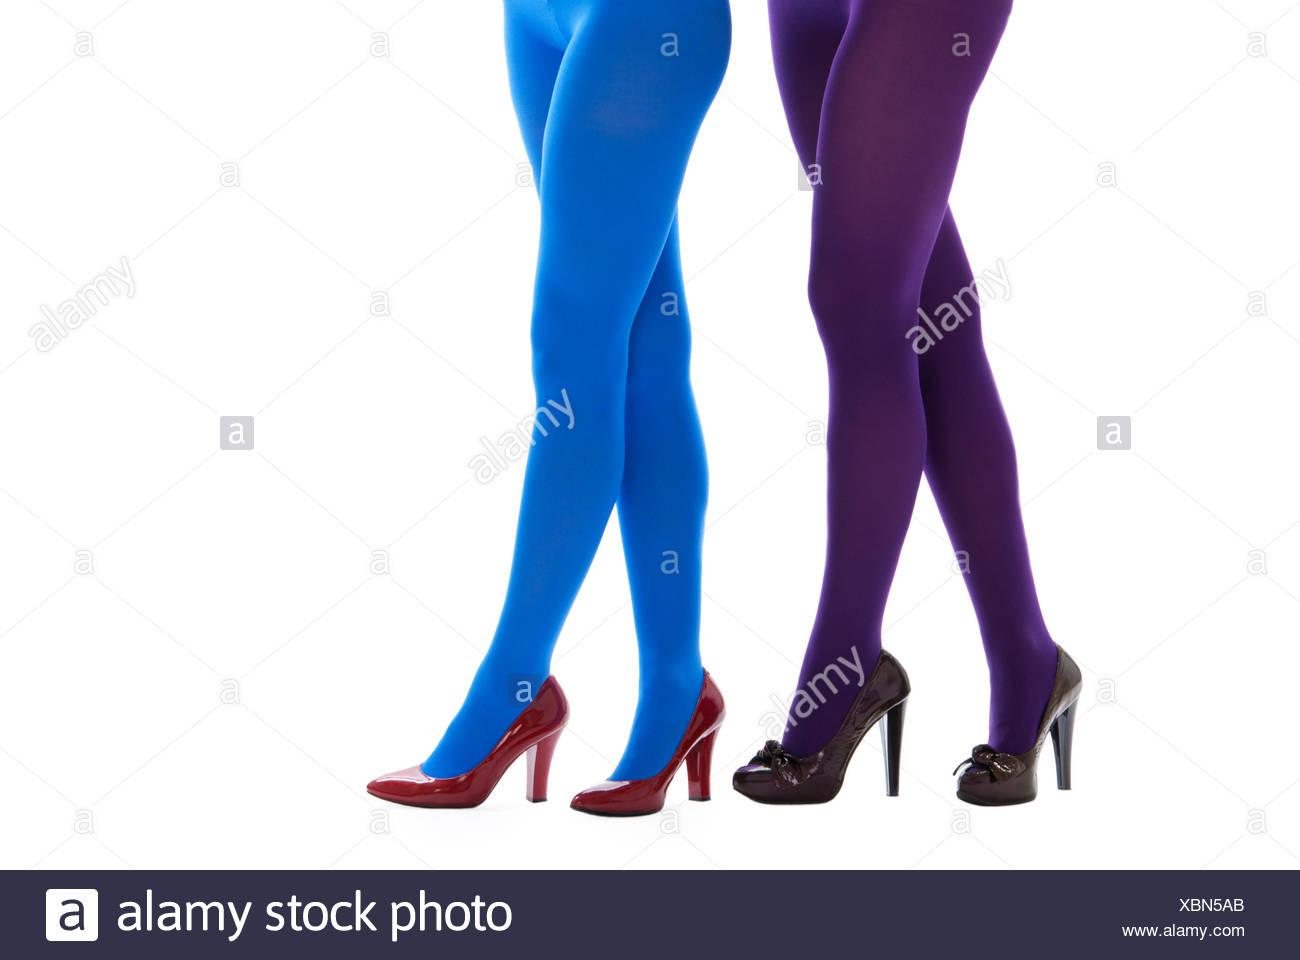 66461f024f6fd Blue Stockings Tights Stock Photos & Blue Stockings Tights Stock ...